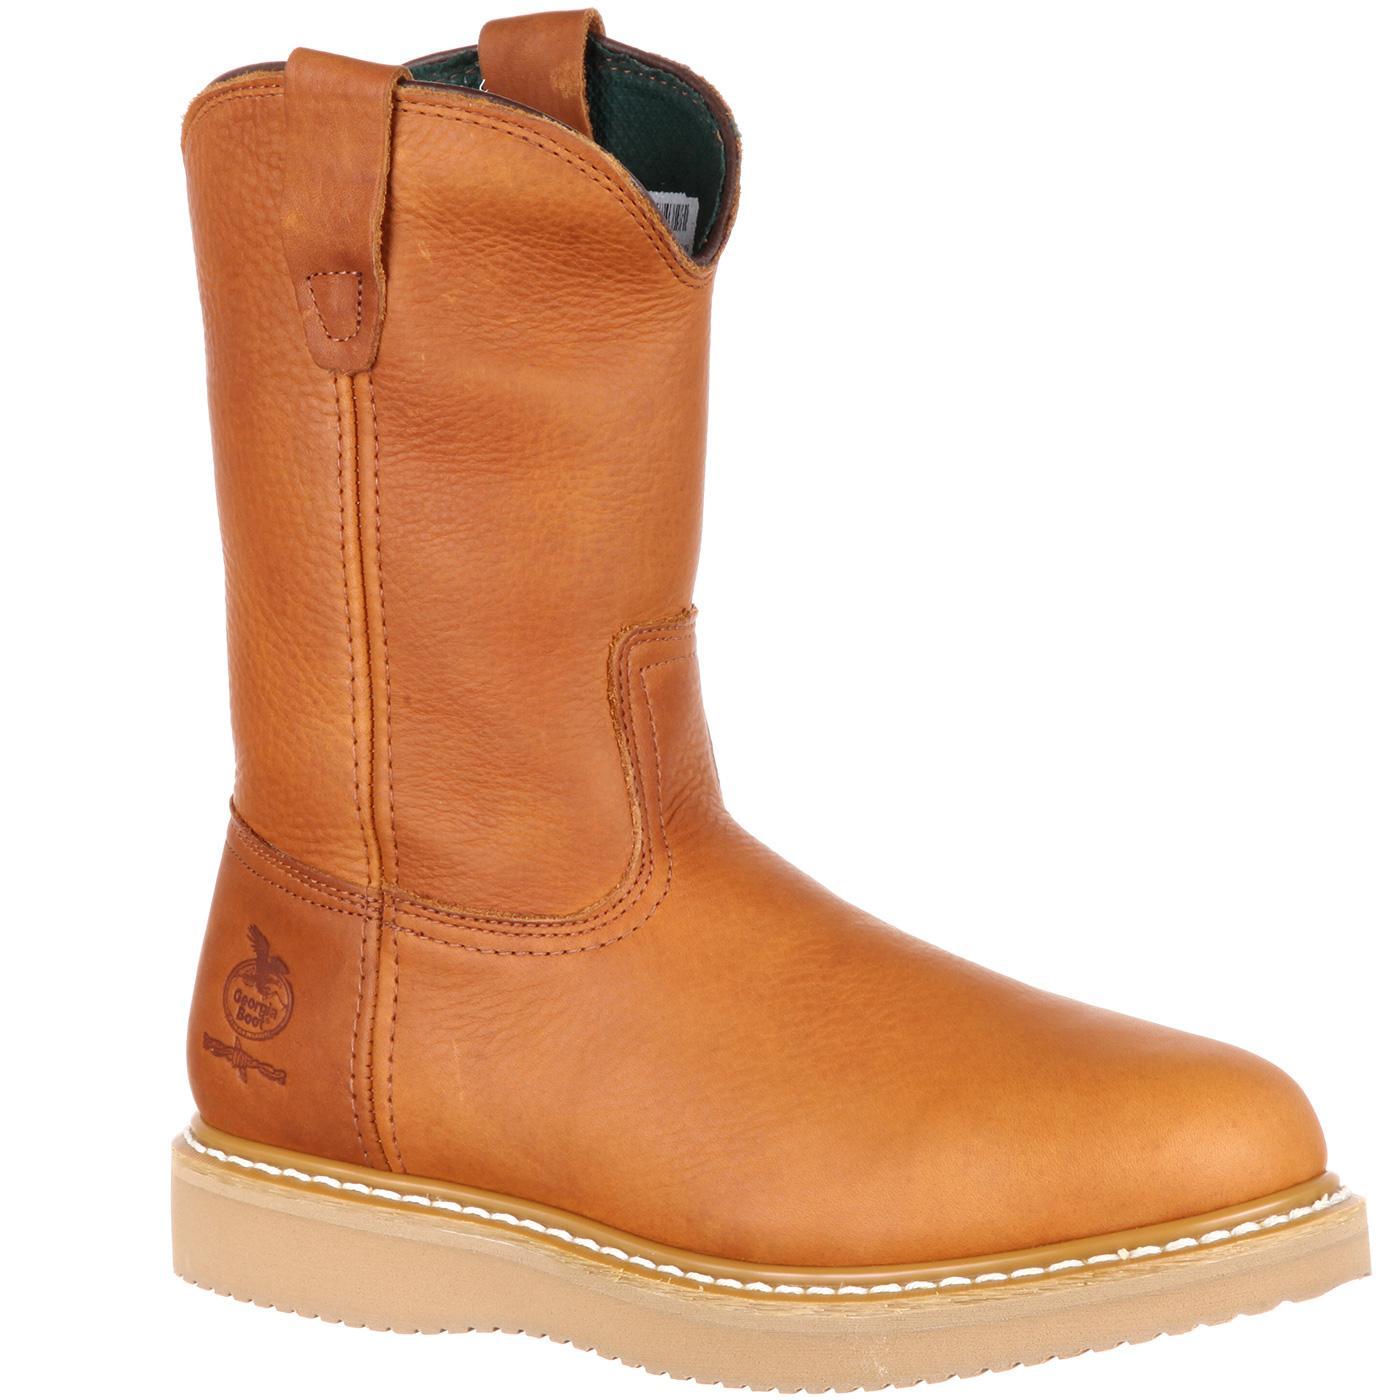 d0aa2754c90 Georgia Boot Wedge Steel Toe Pull On Work Boot